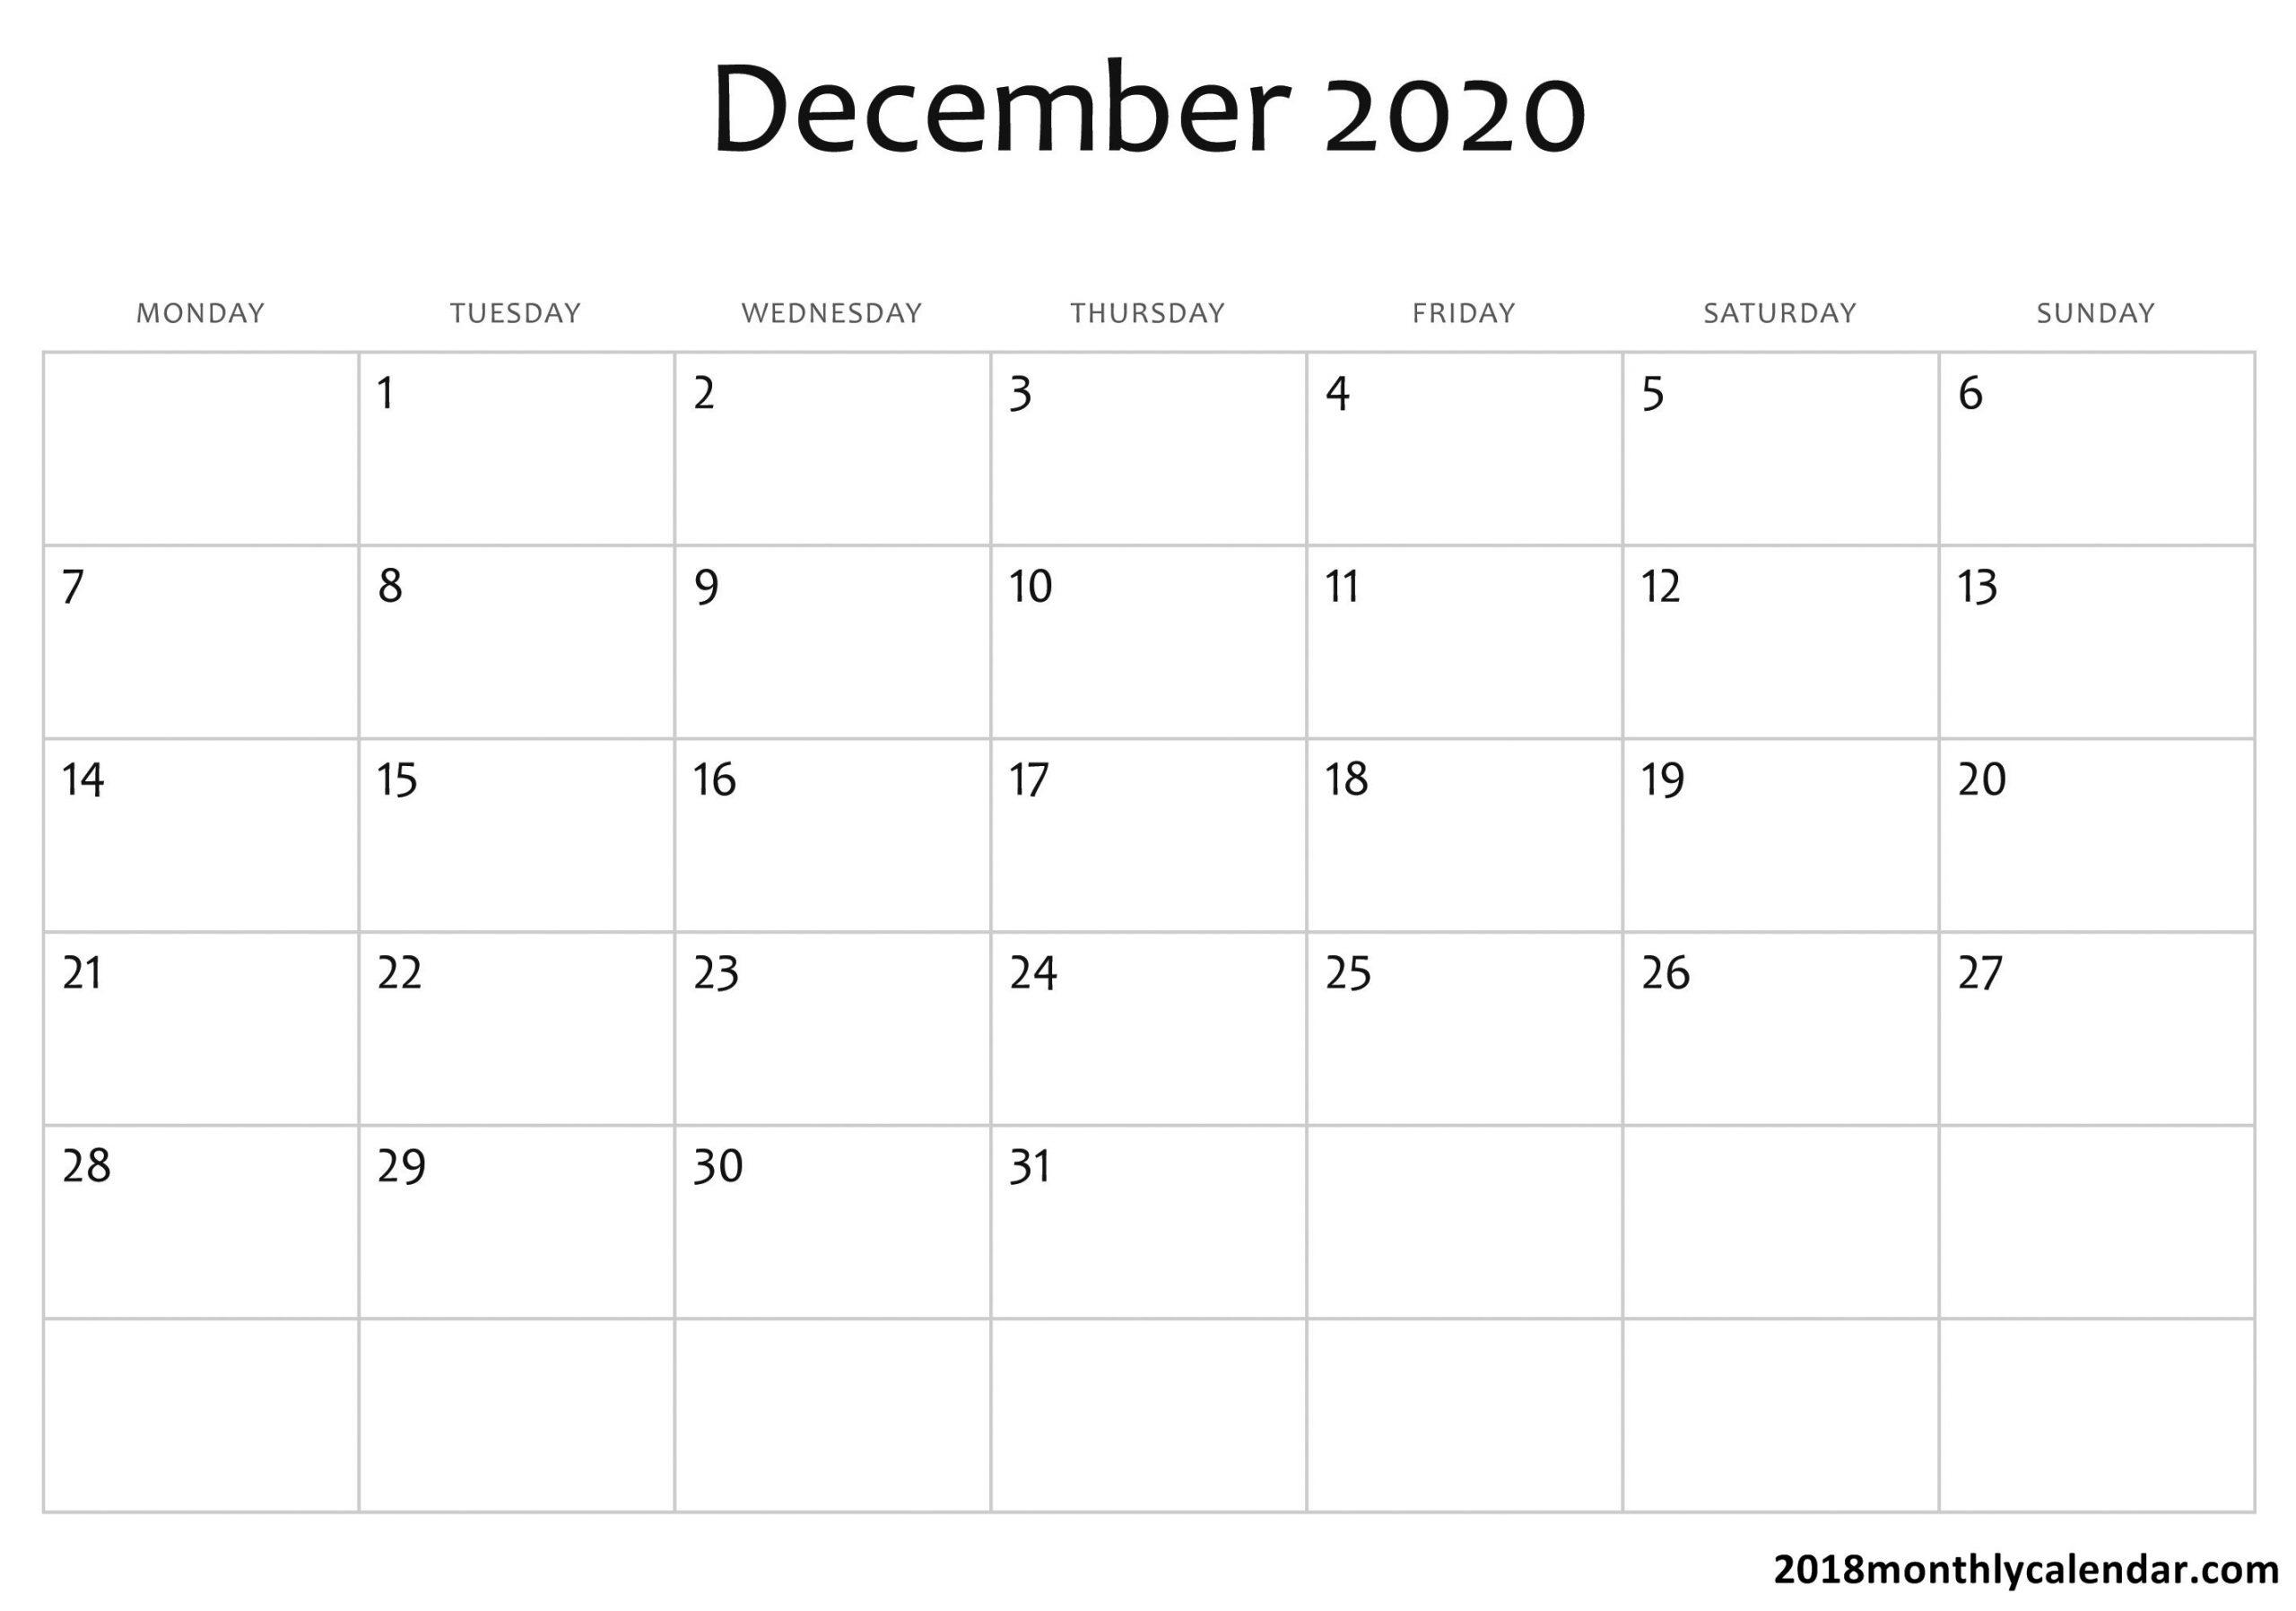 2019-2020 Calendar Financial Week Numbers - Calendar Printable Calendar I Can Edit